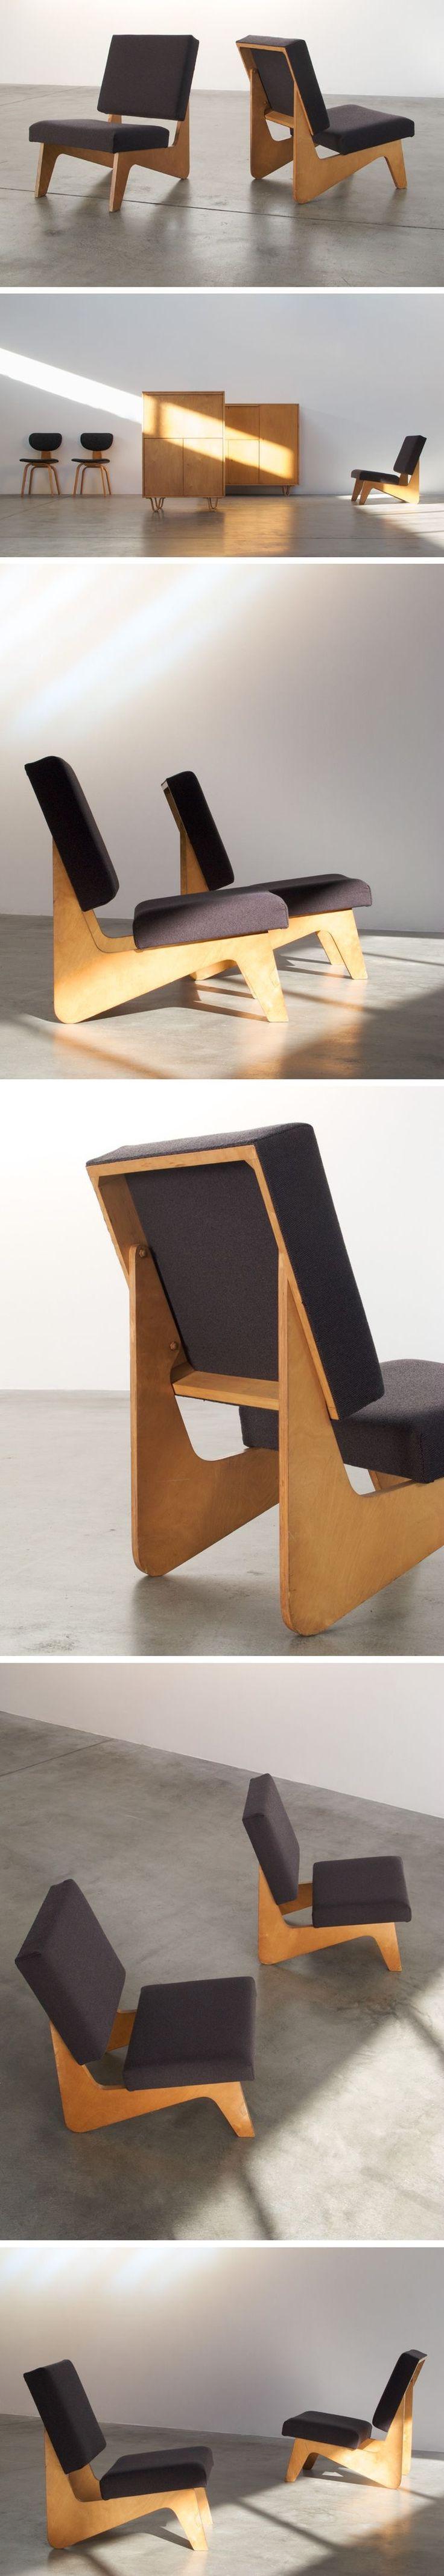 169 best furniture images on Pinterest